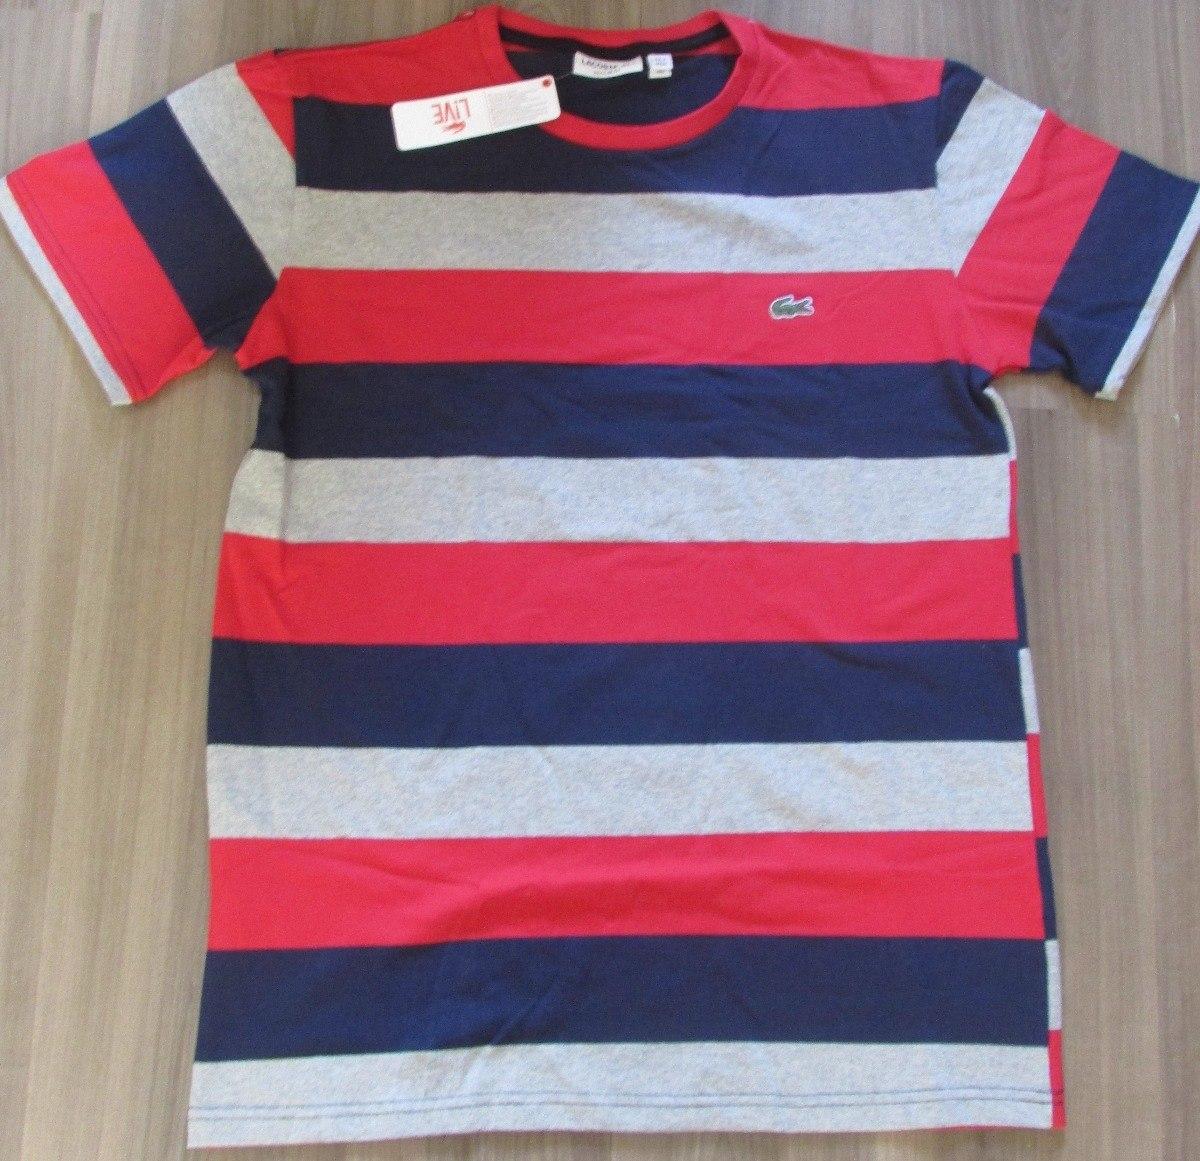 Camiseta Lacoste Live Original Peruana Oferta Listrada Tam P R 65